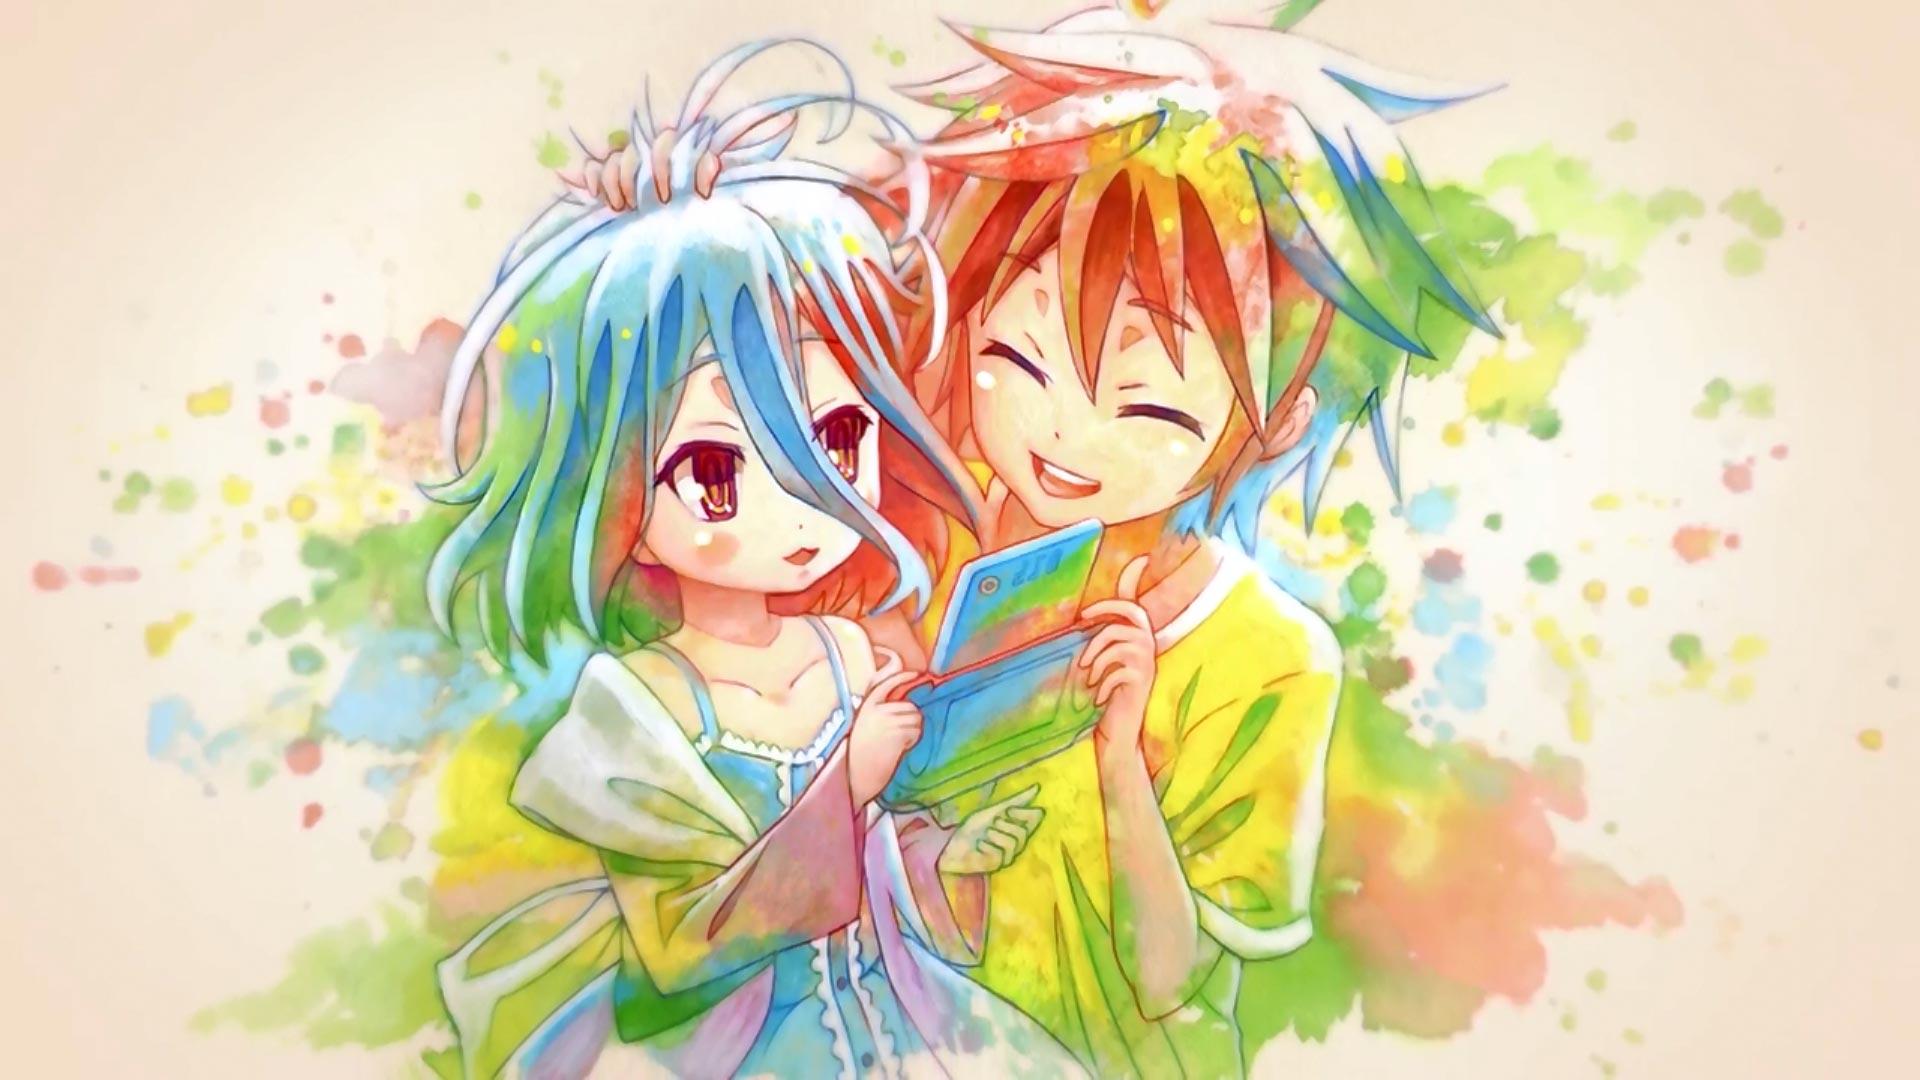 Shiro and Sora